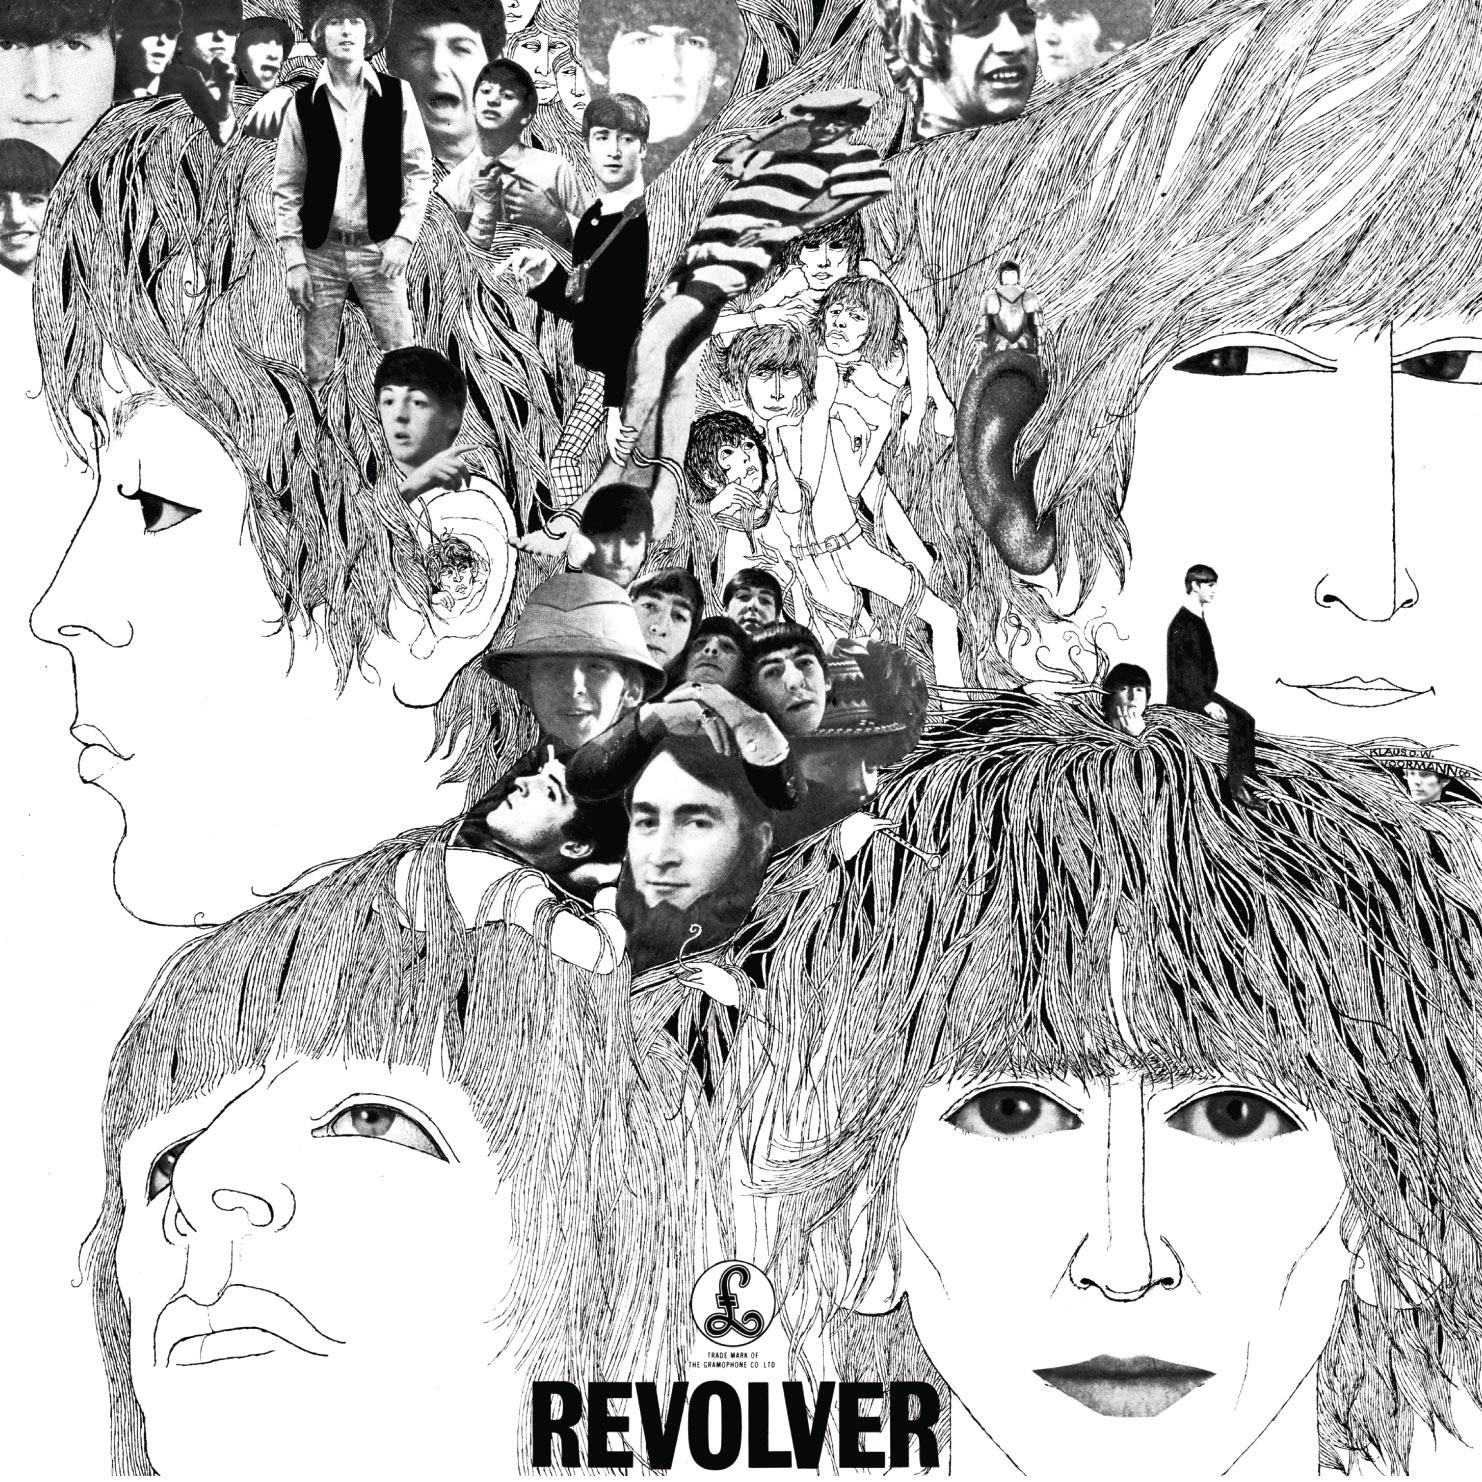 THE BEATLES   Revolver, 1966, George Martin, 35:01